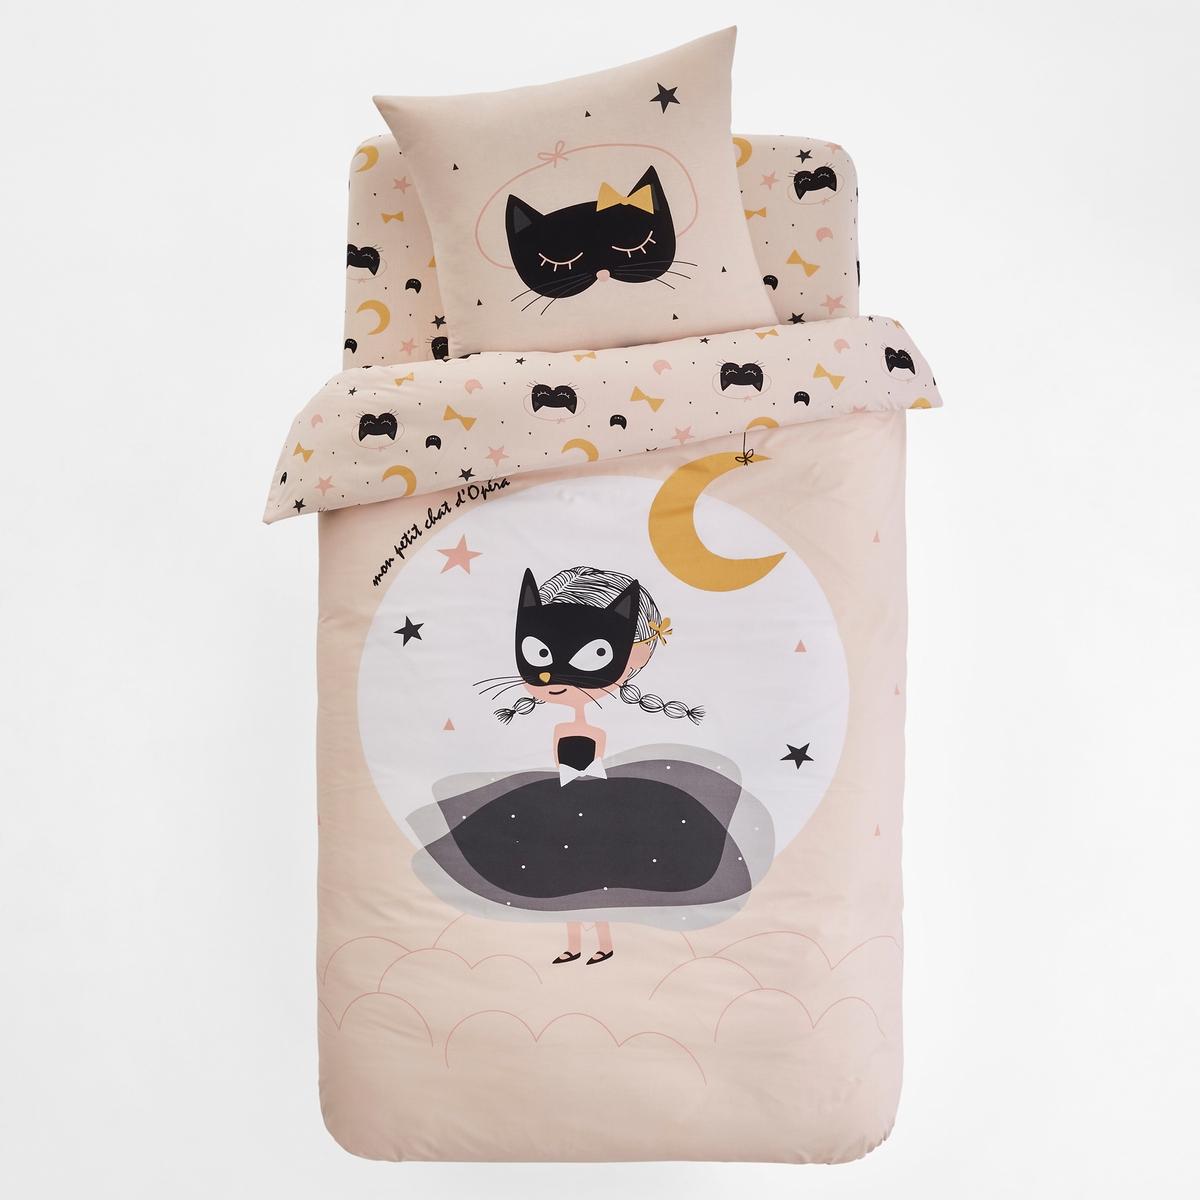 Bedruckter Kinder-Bettbezug CAT OPERA | Kinderzimmer > Kinderbetten | Rosa | Baumwolle - Bedruckt | La Redoute Interieurs